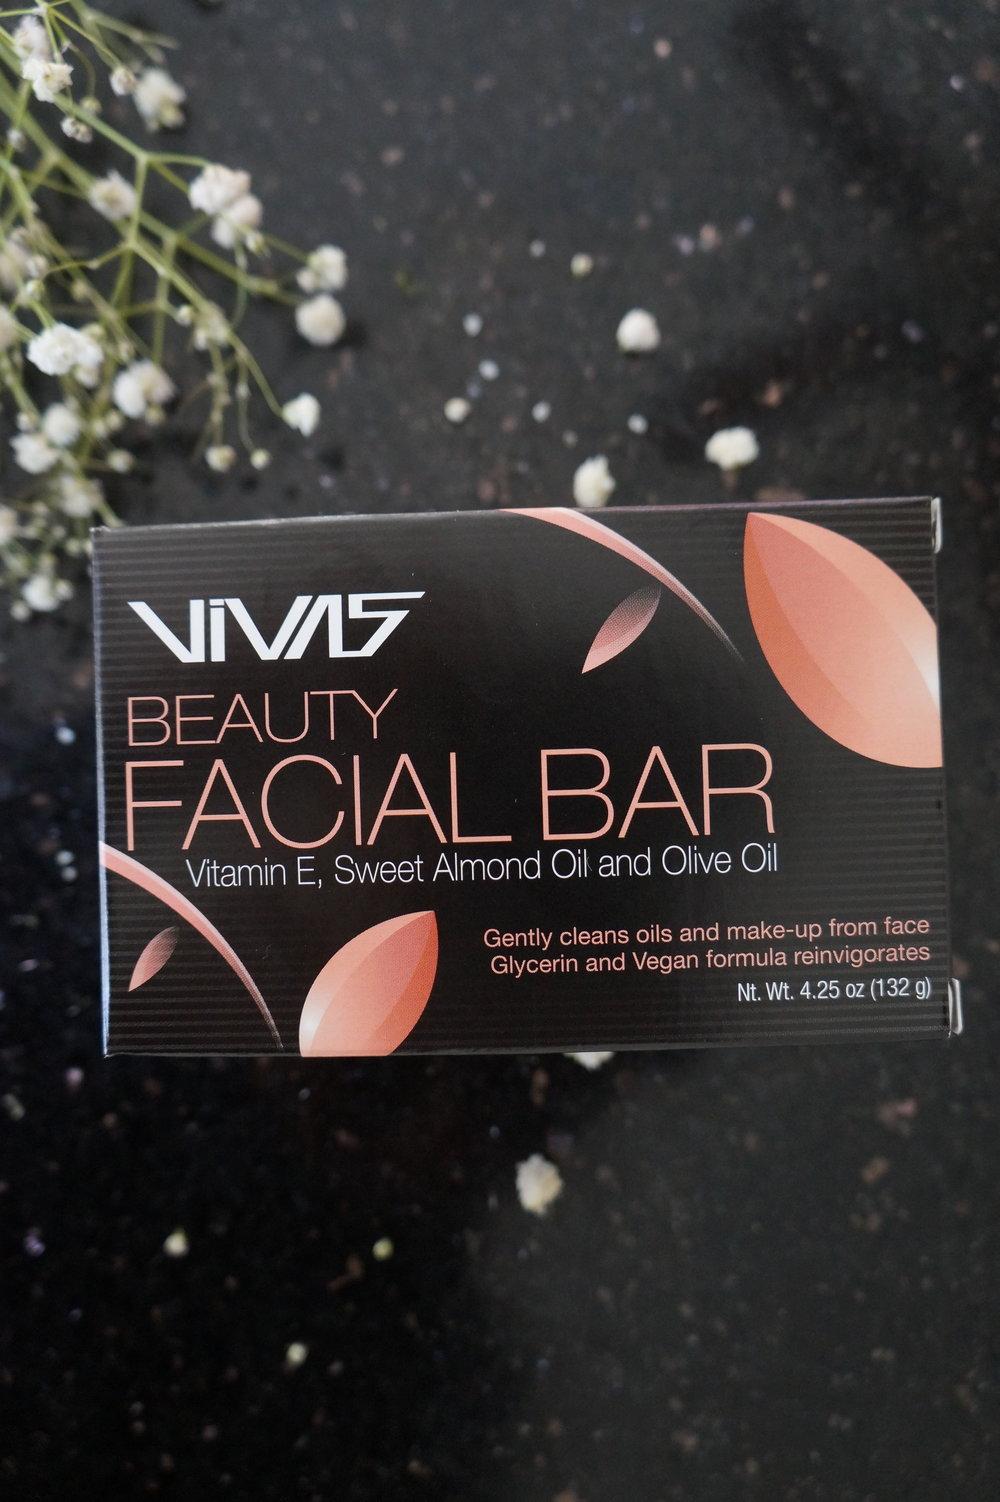 Andrea Fenise Memphis Fashion Blogger and Memphis Beauty Blogger reviews VIVA Facial Bar by Ampro